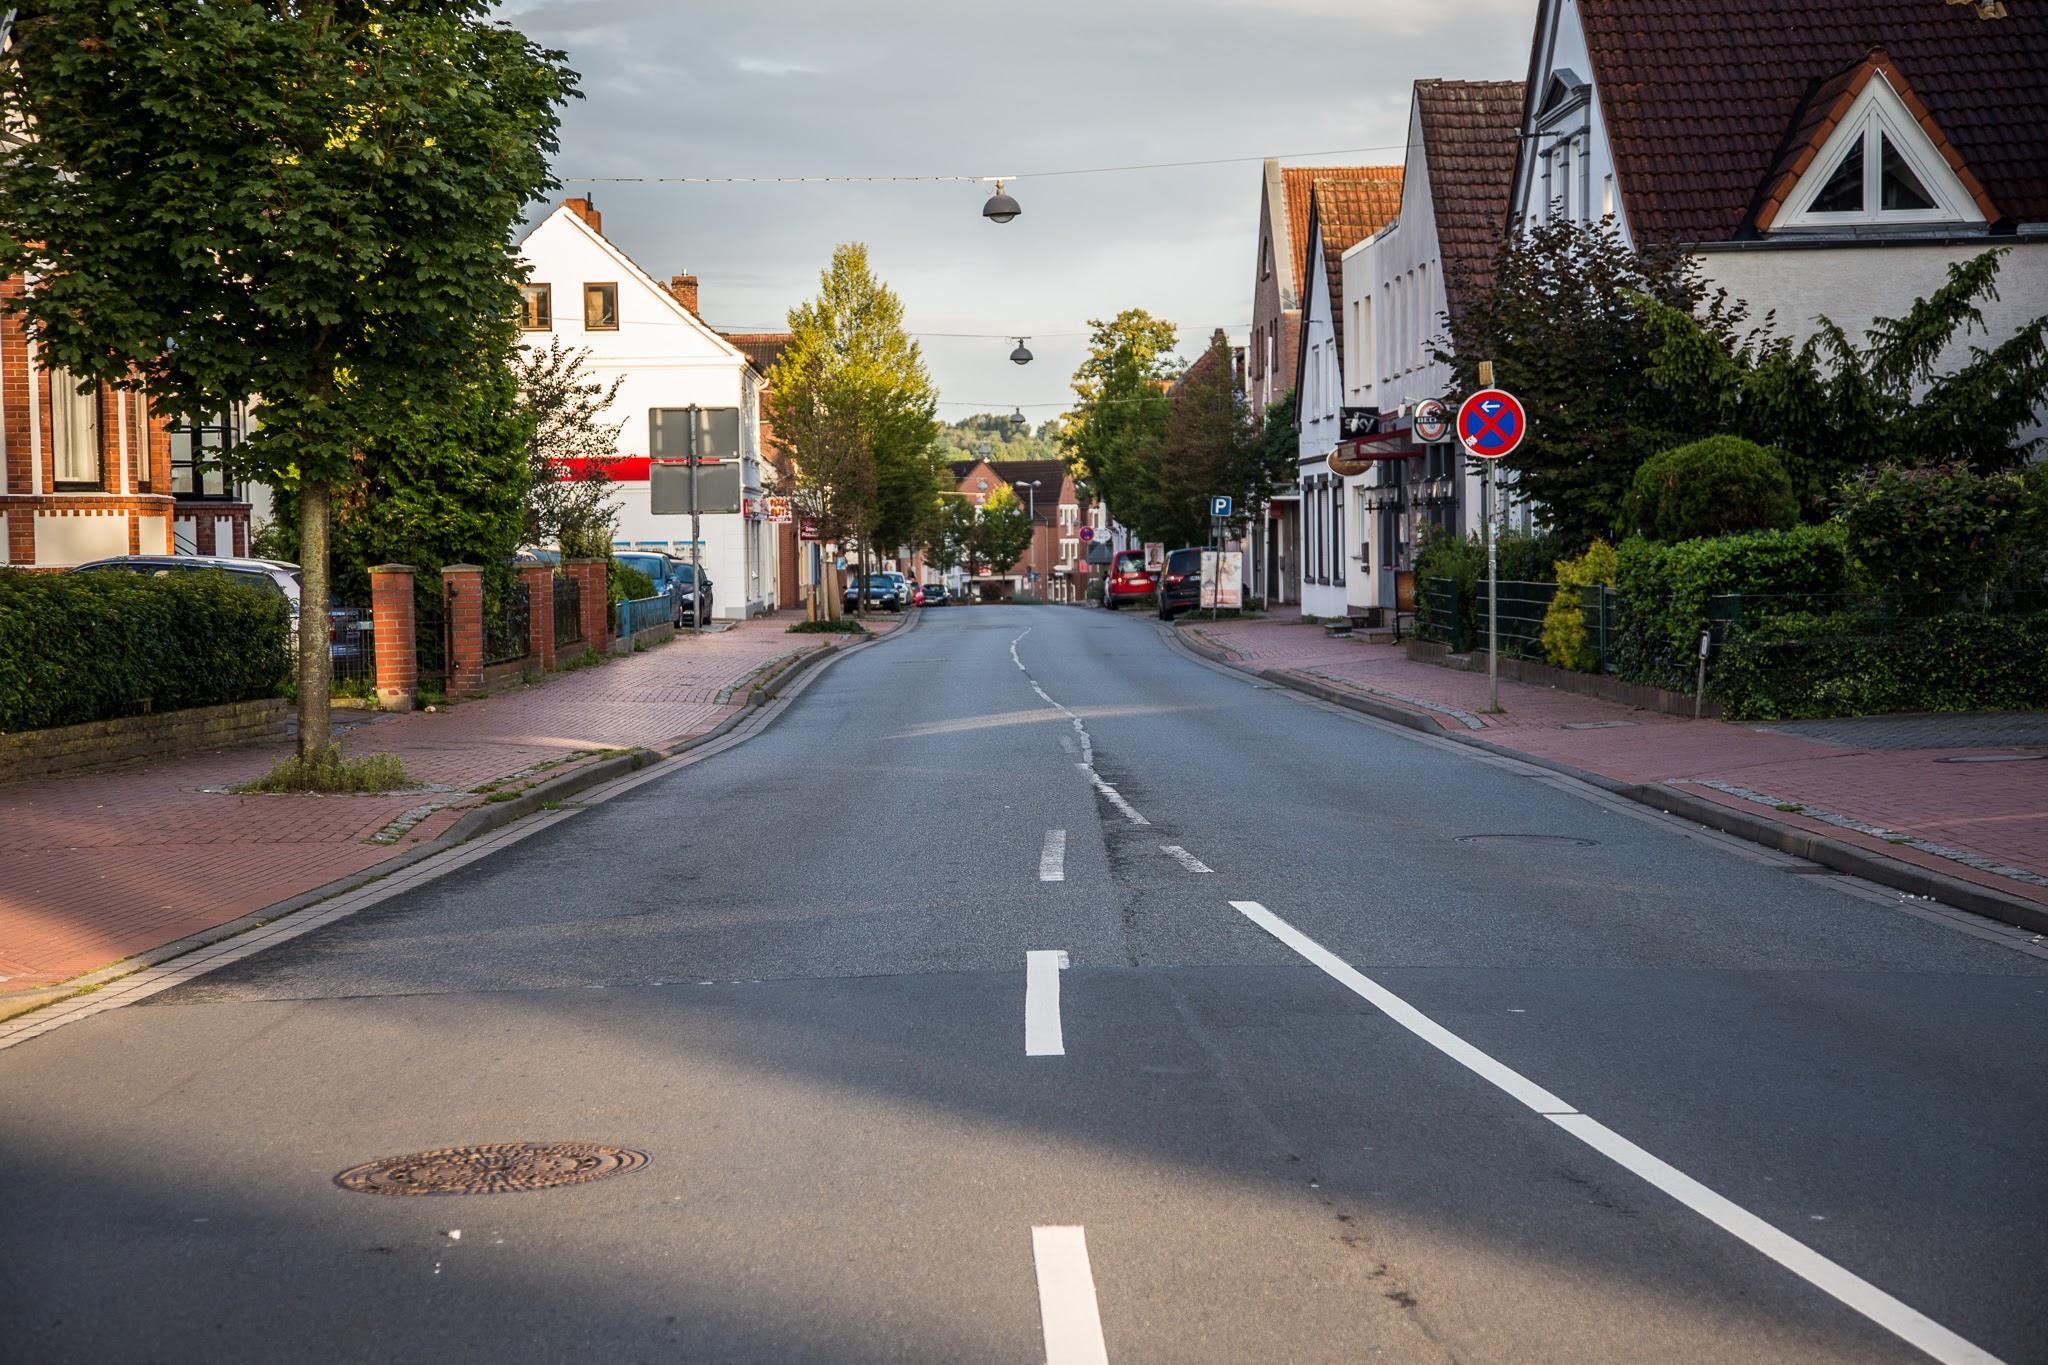 Bahnhofstraße in Osterholz-Scharmbeck